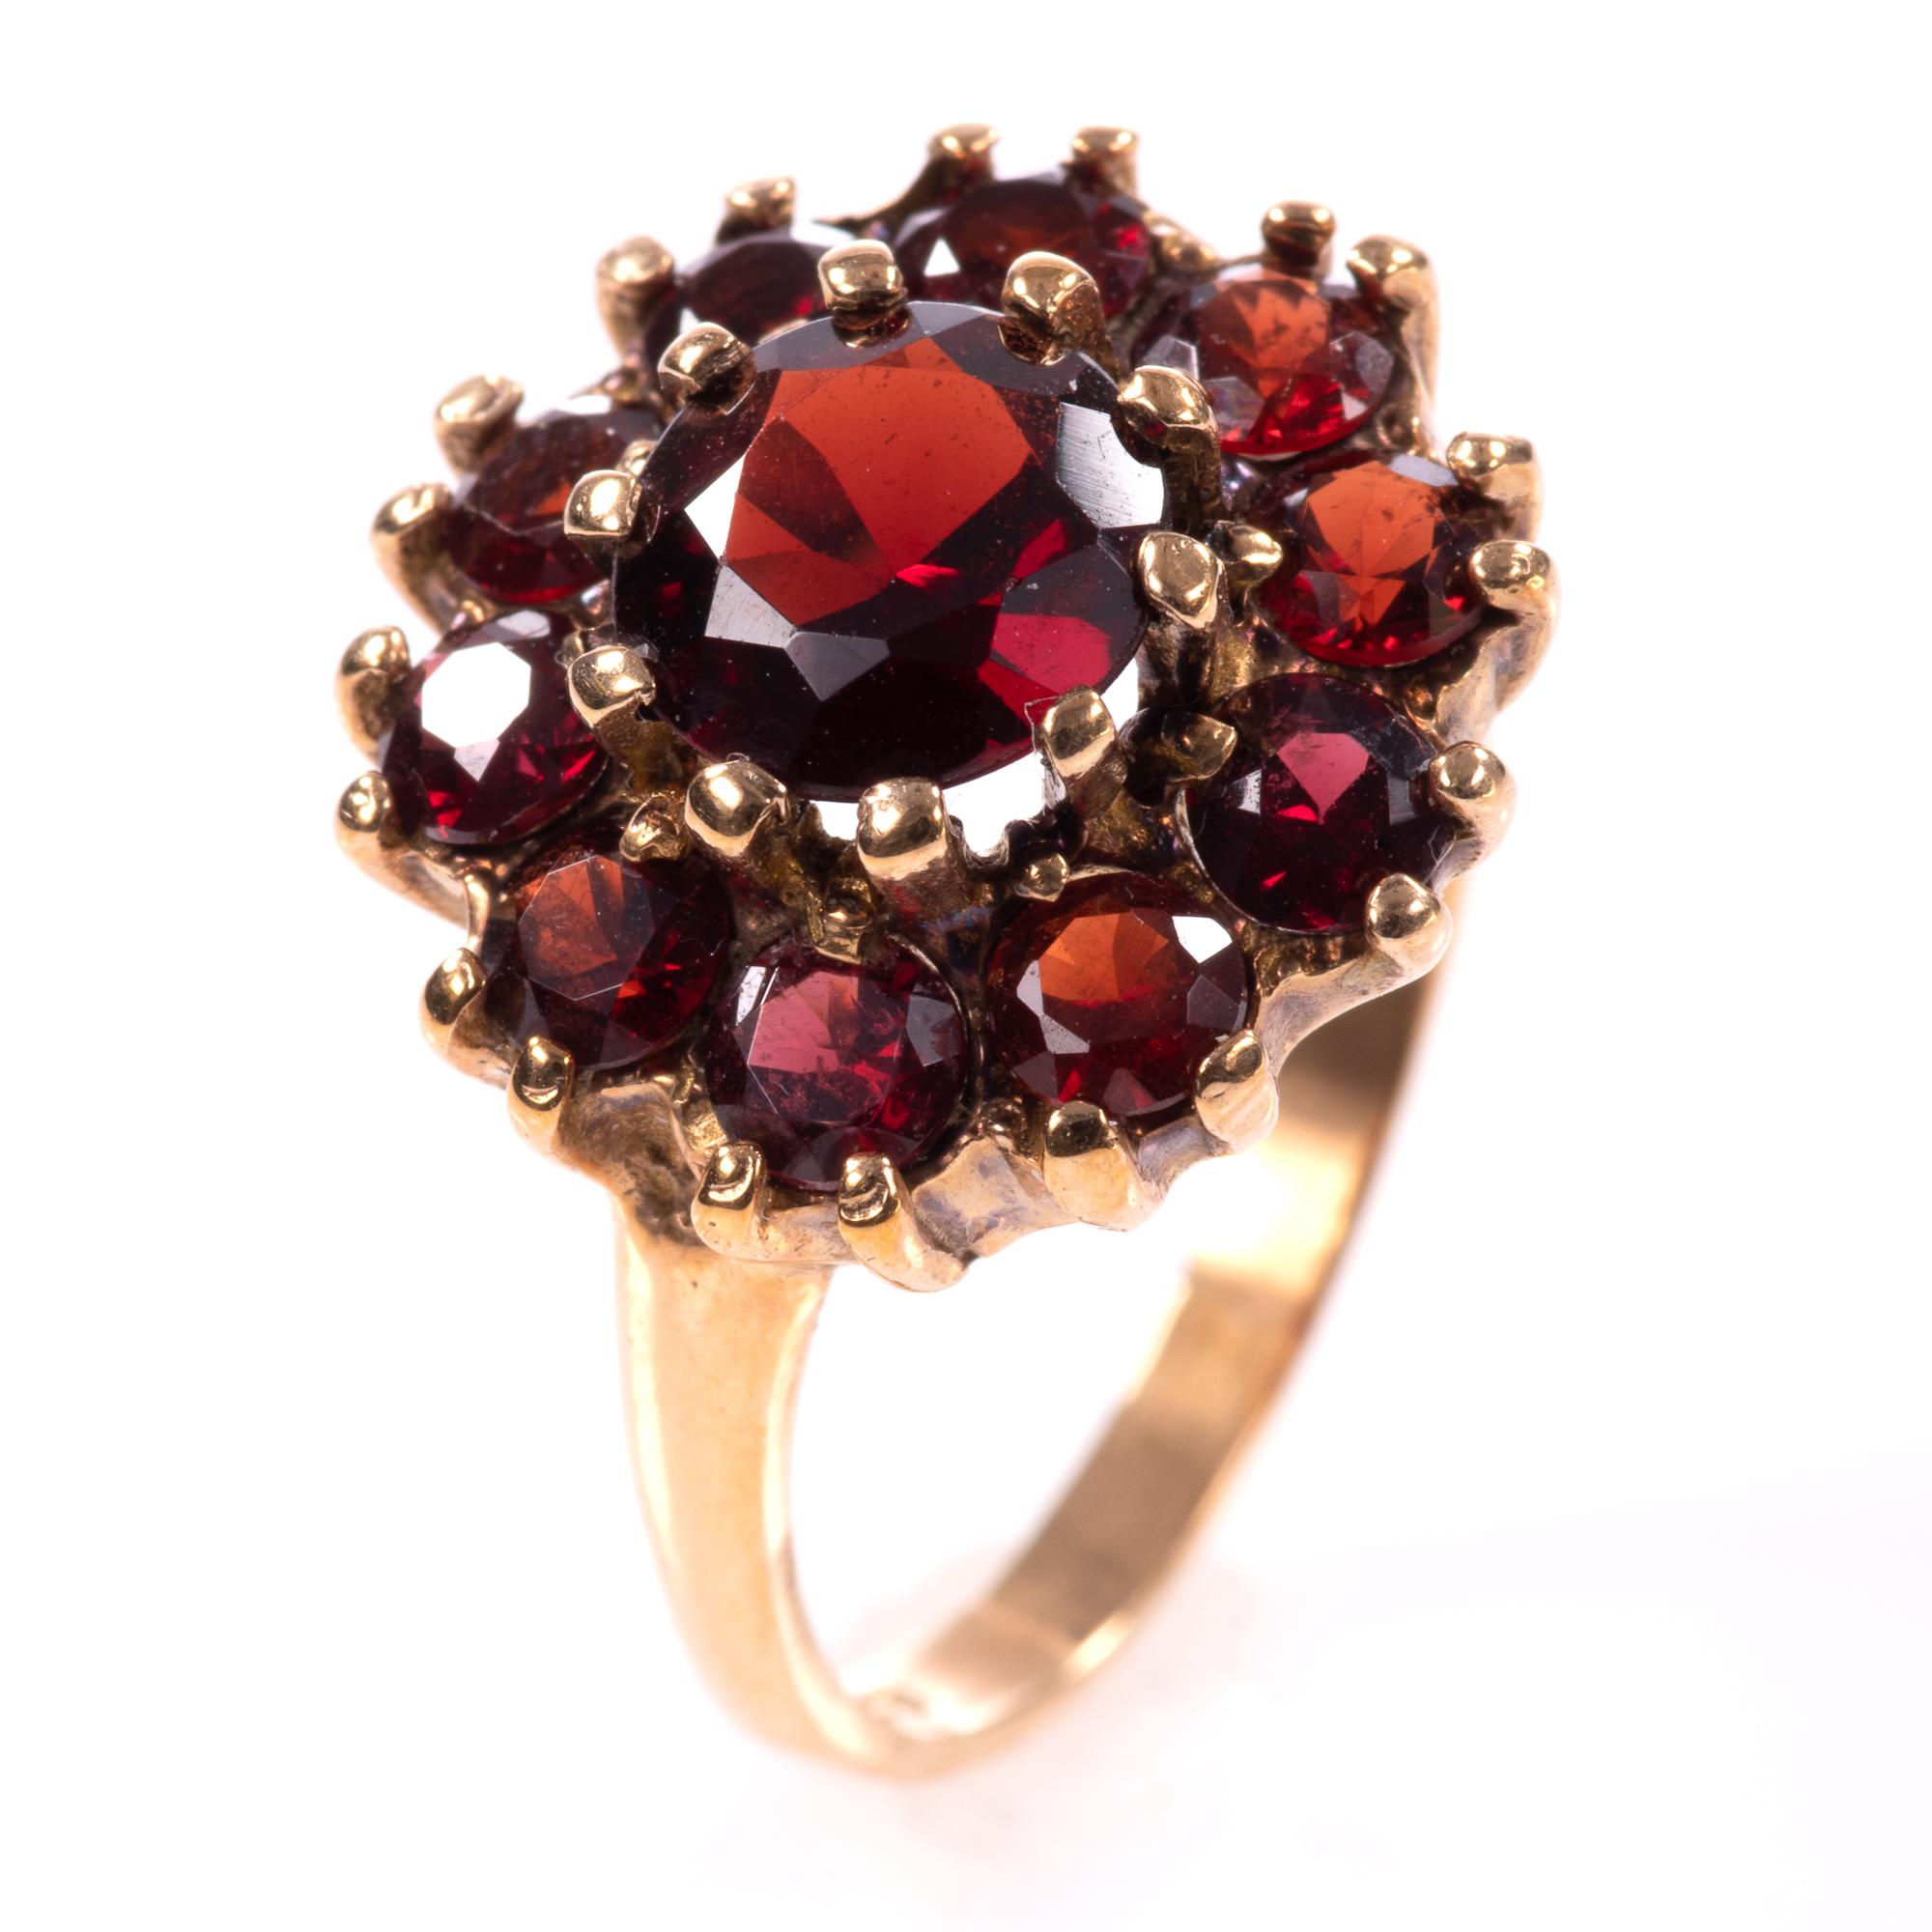 9ct Gold Garnet Ring London 1963